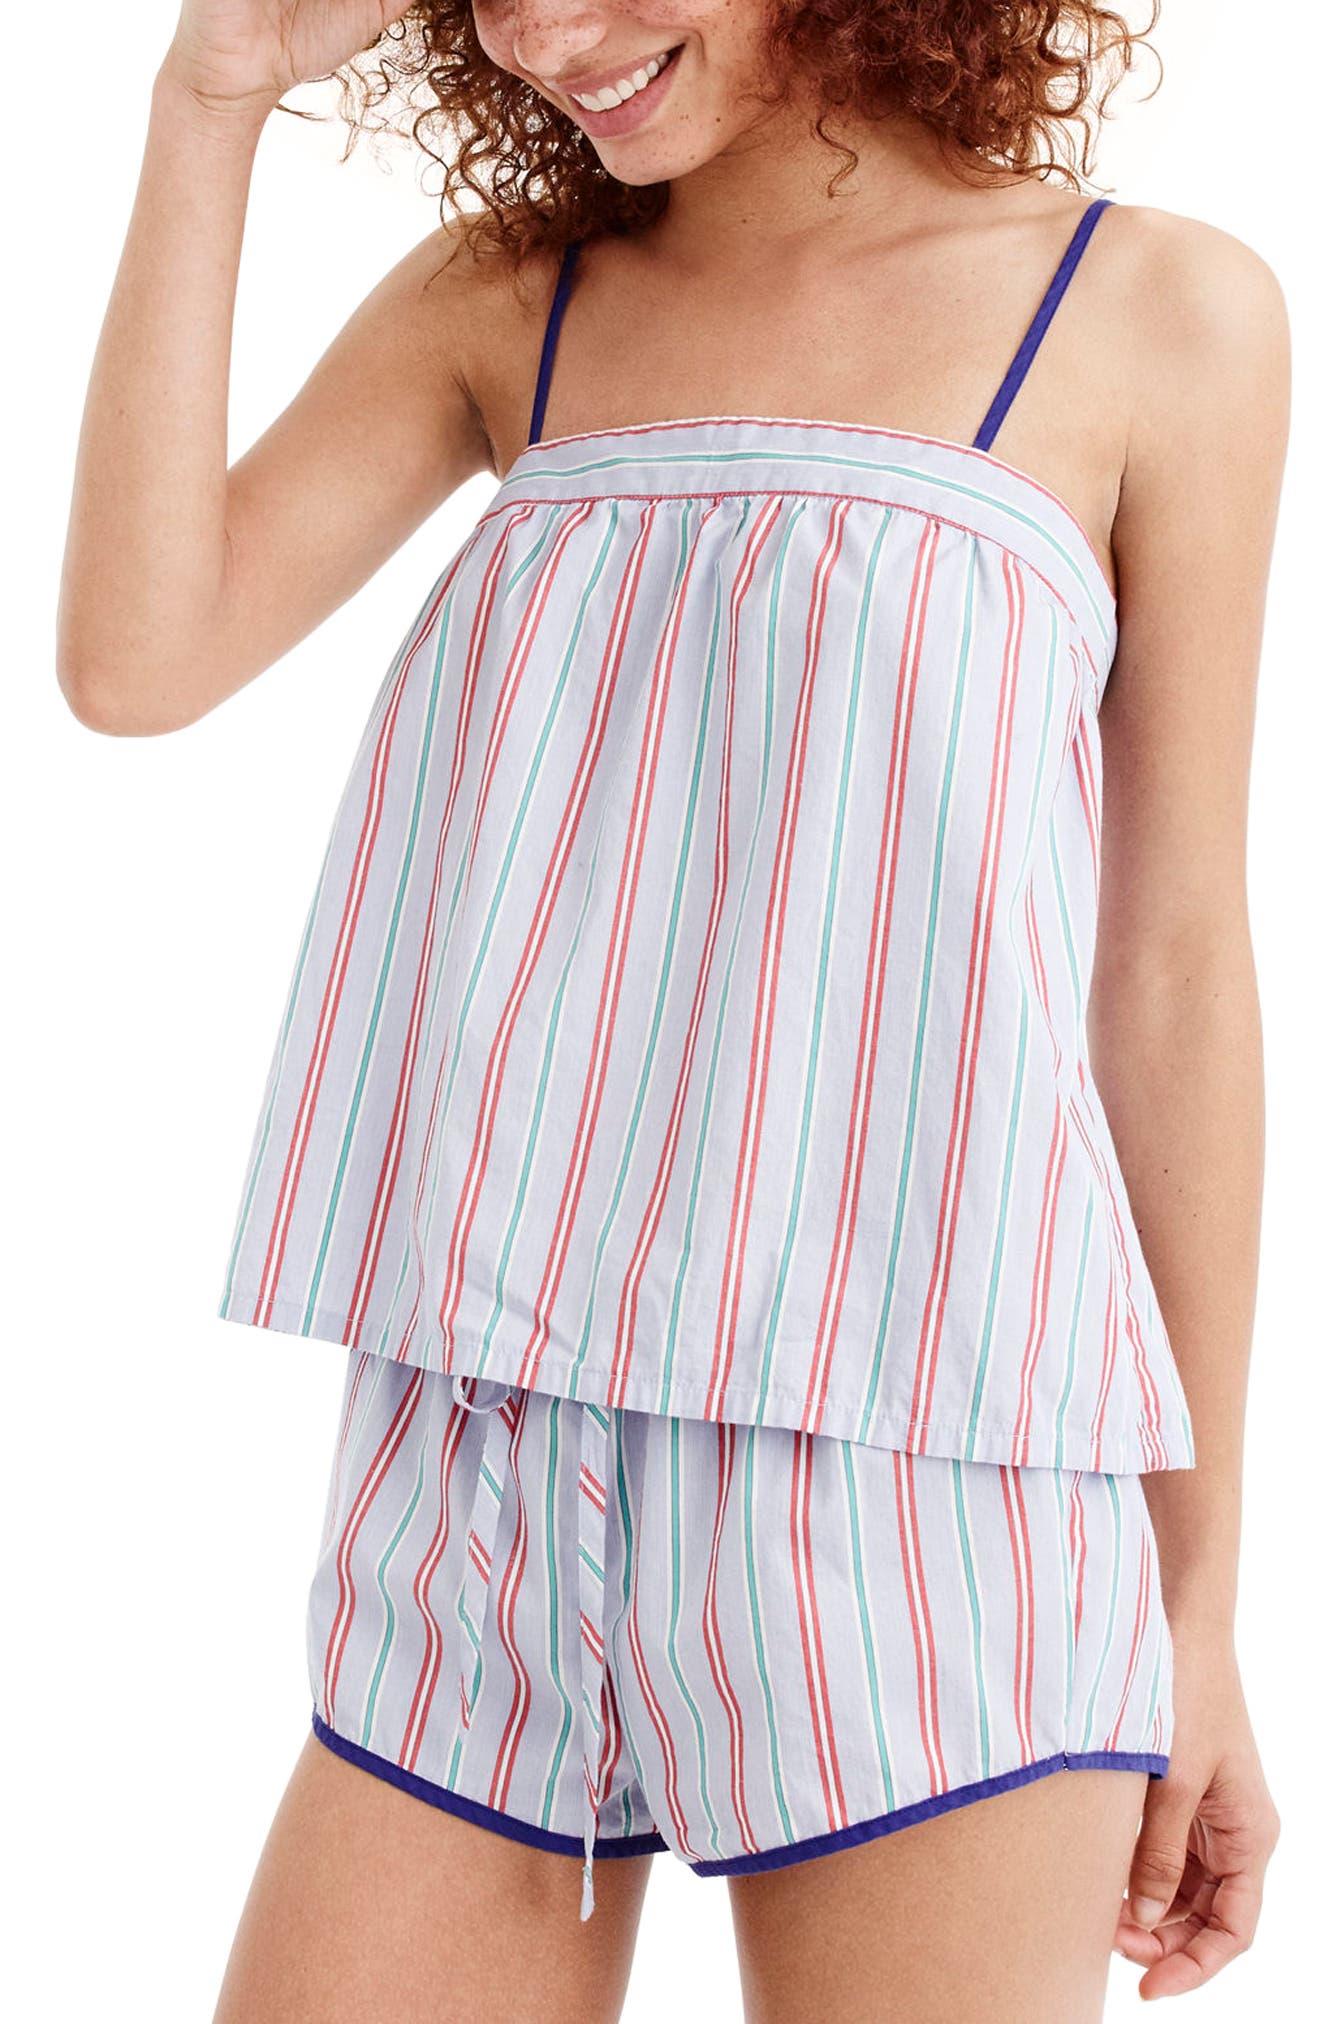 J.Crew Candy Stripe Short Pajamas,                             Main thumbnail 1, color,                             Holiday Stripe